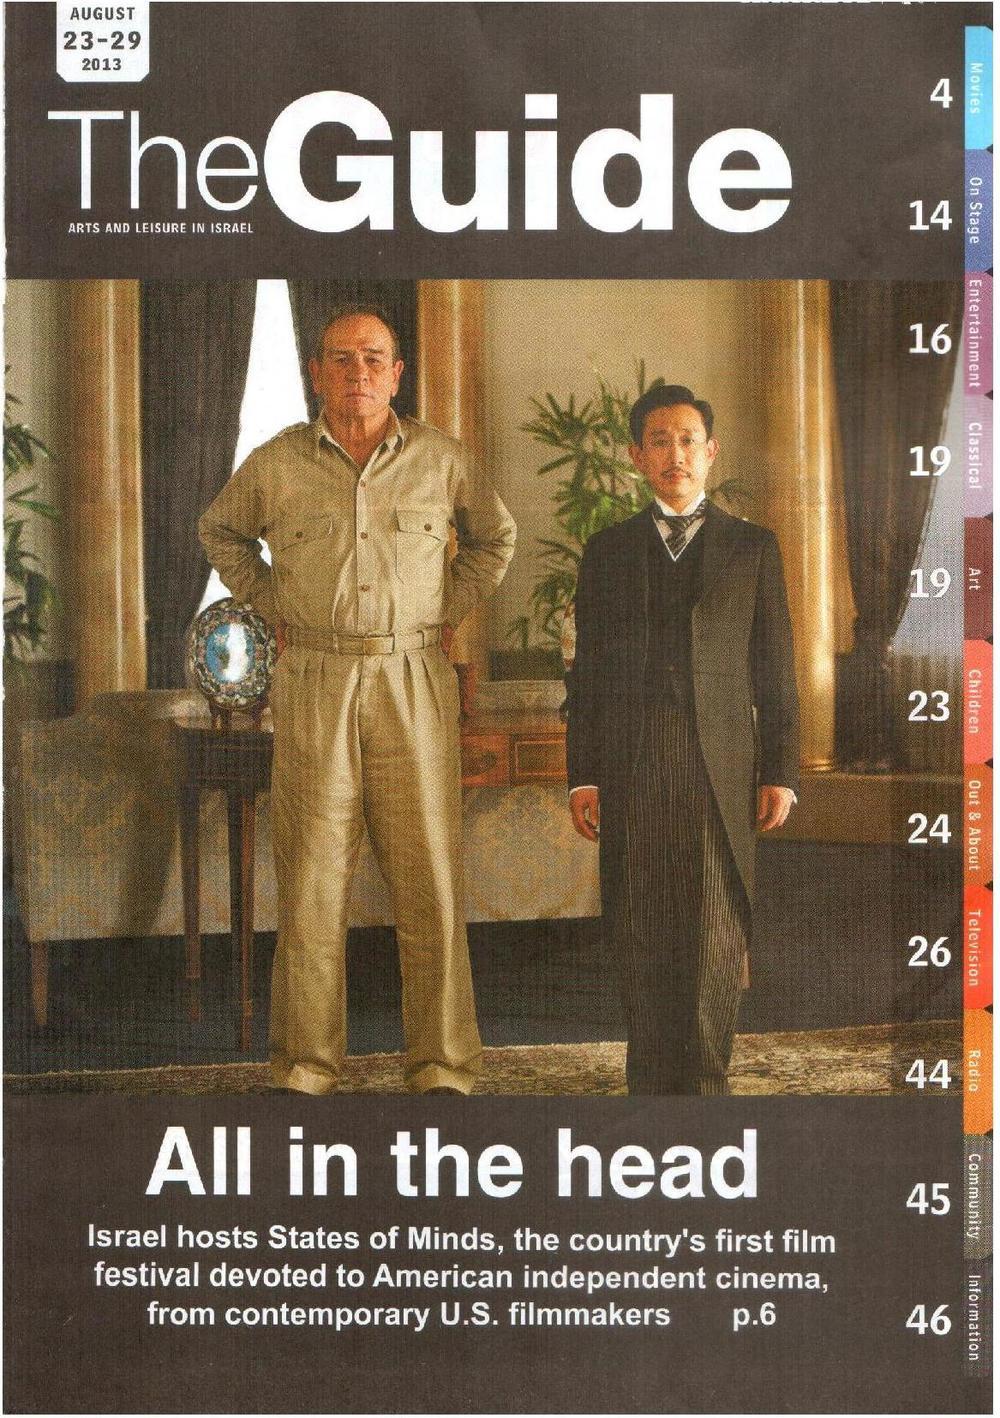 Haaretz Guide Cover 8-23-13-page-001.jpg